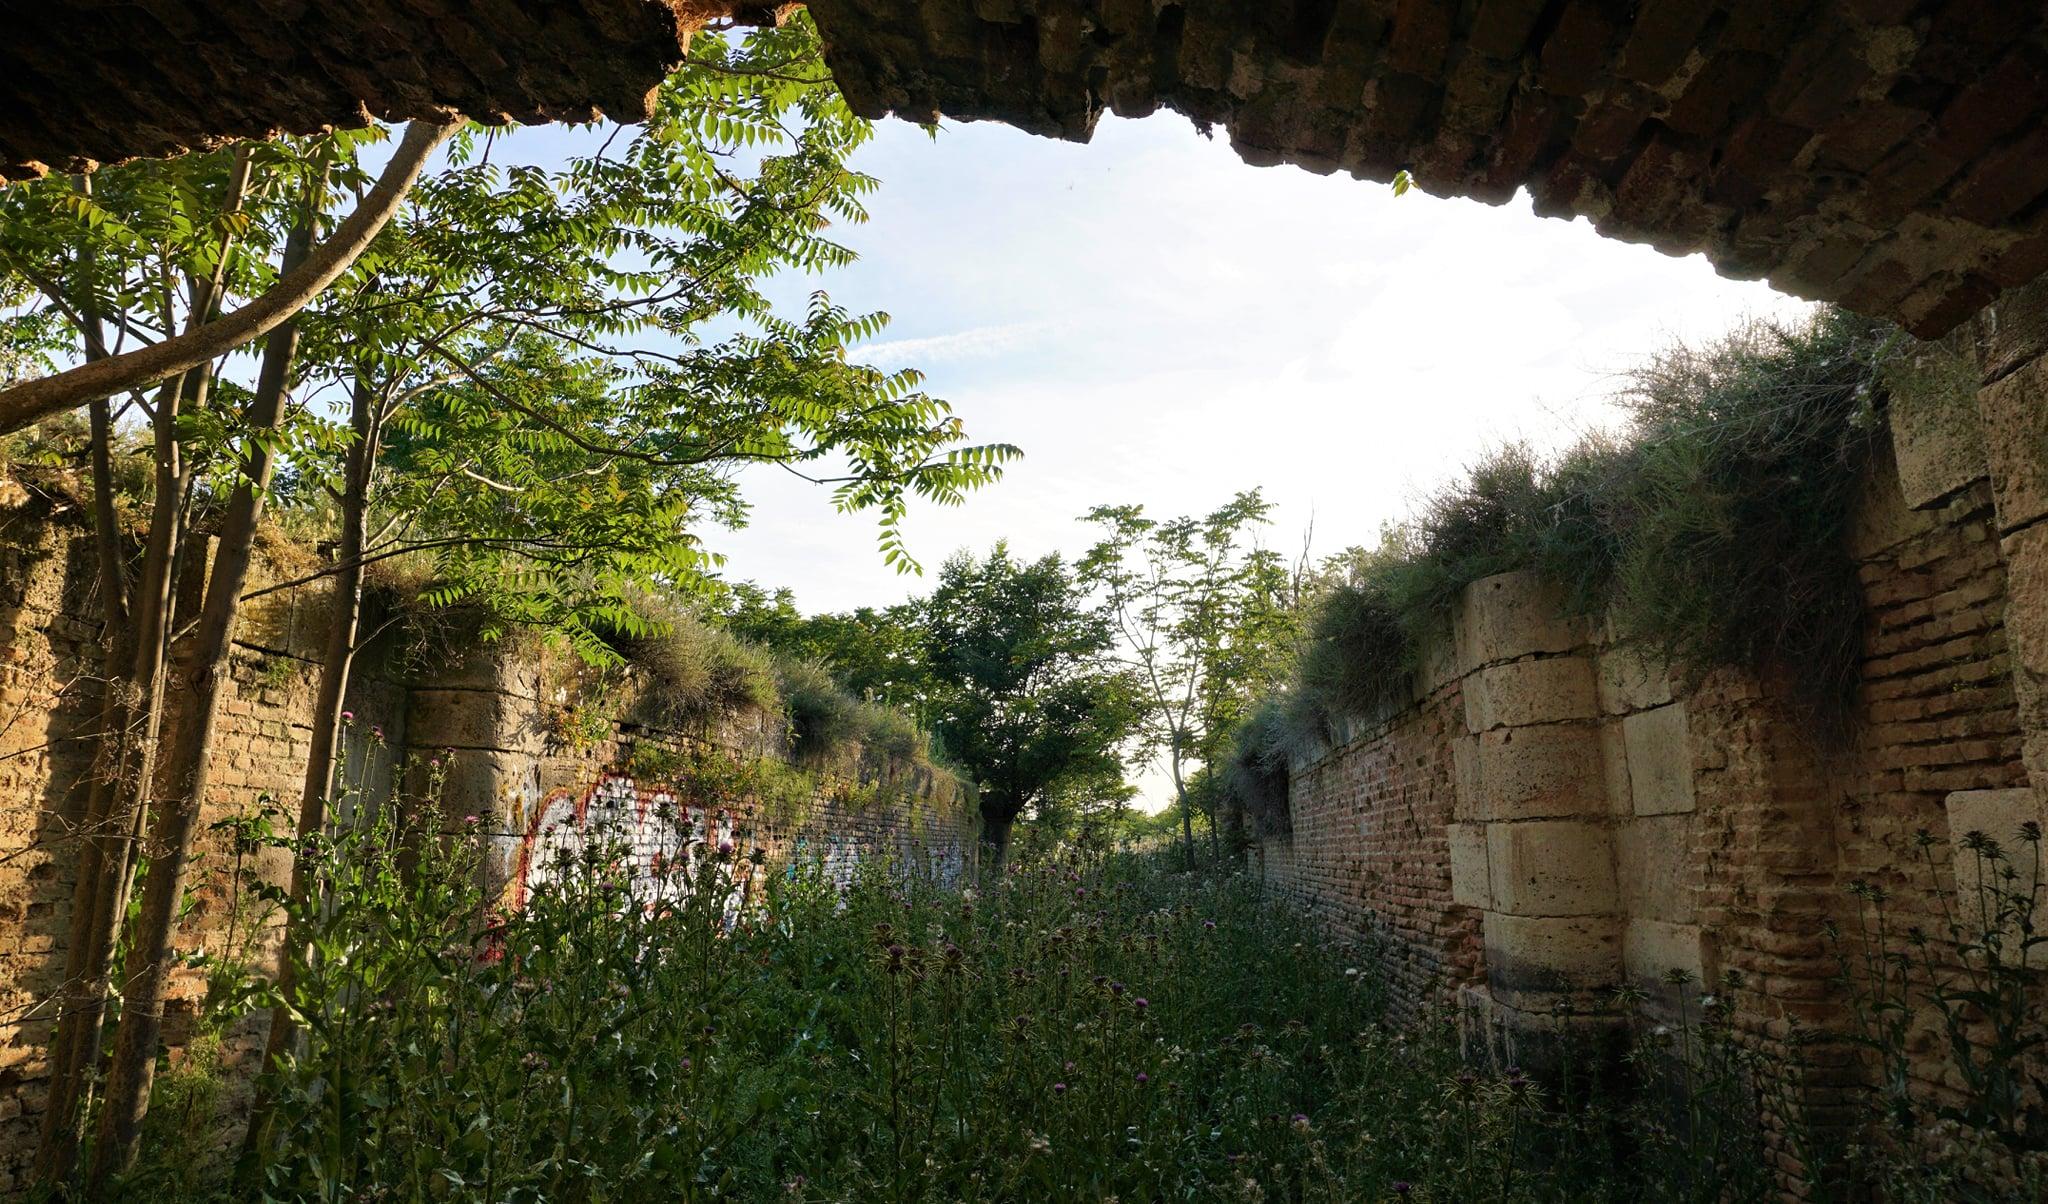 Última esclusa, la número 10 del proyecto del Canal navegable del Manzanares. Fotos: Juan Ruiz Ibáñez